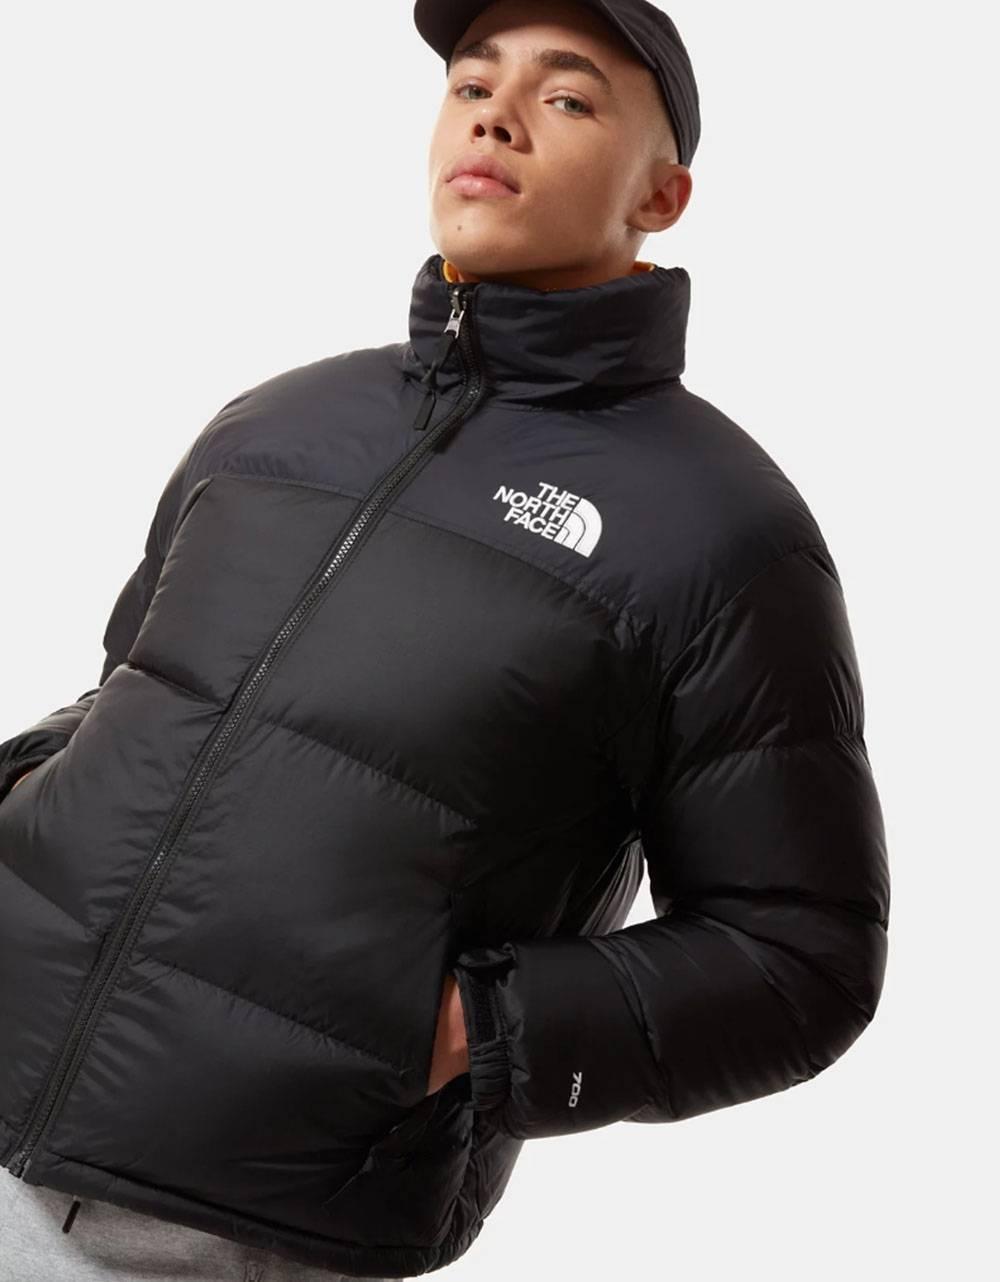 The North Face 1996 retro nuptse jacket - black THE NORTH FACE Bomber 229,51€